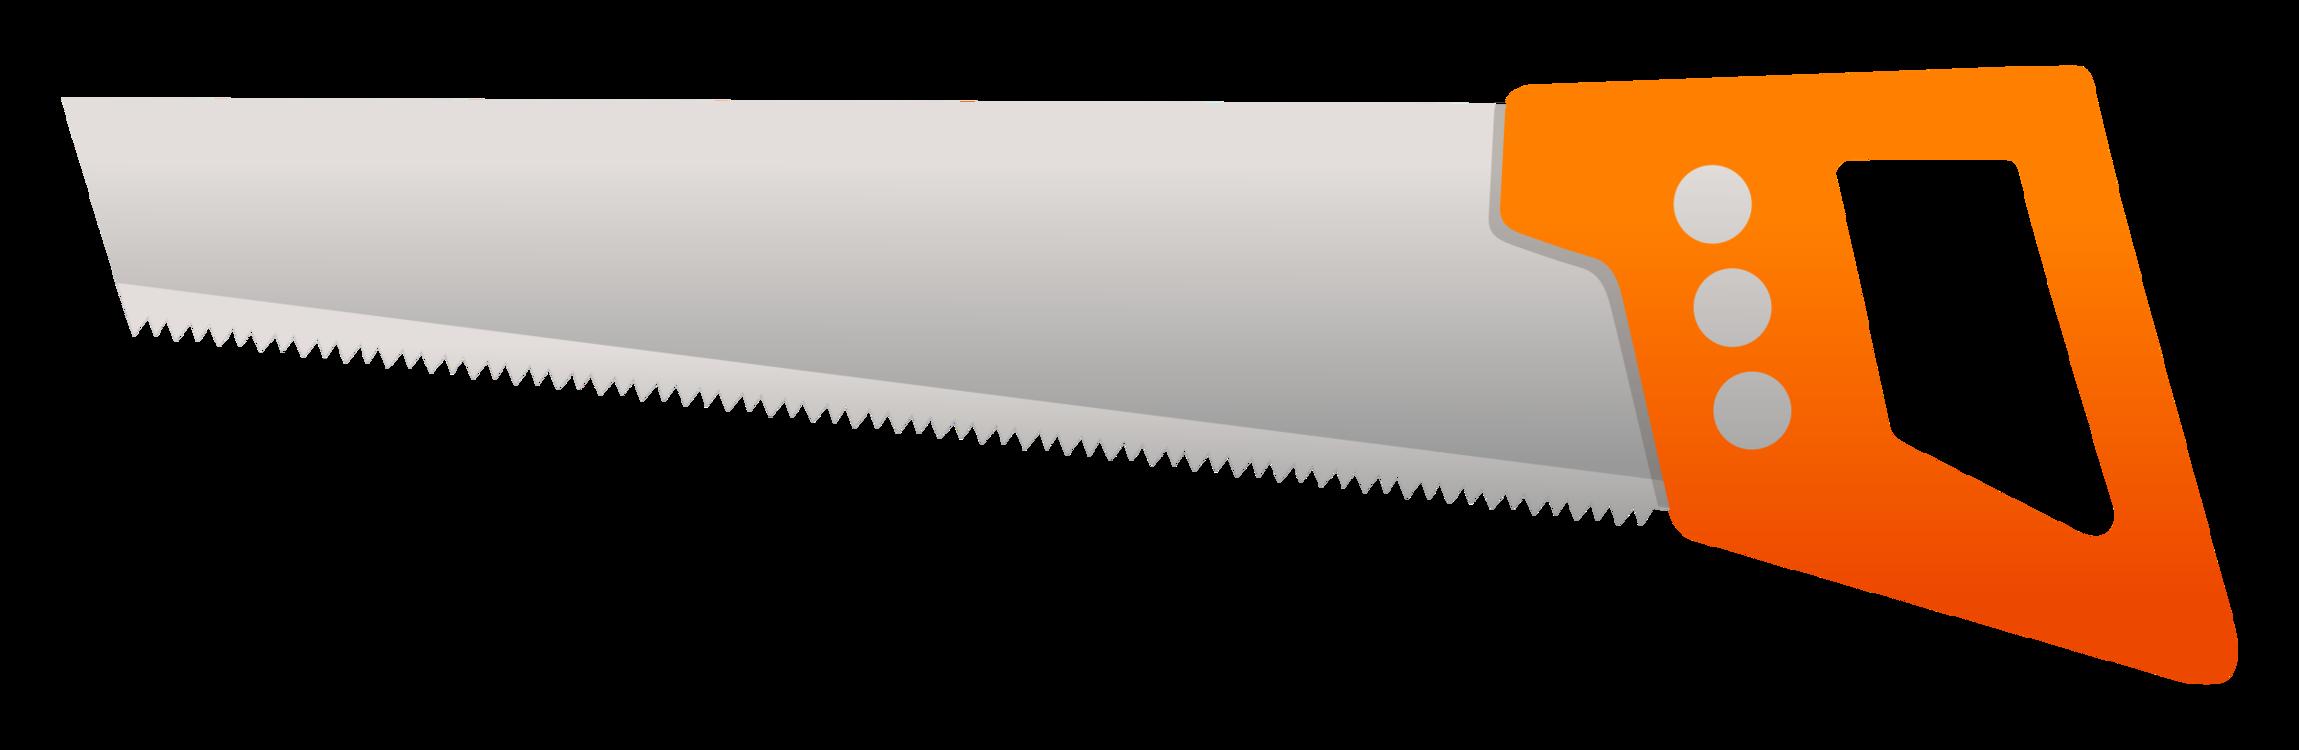 hand saws circular saw tool crosscut saw free commercial clipart rh kisscc0 com sew clip art saw clipart free